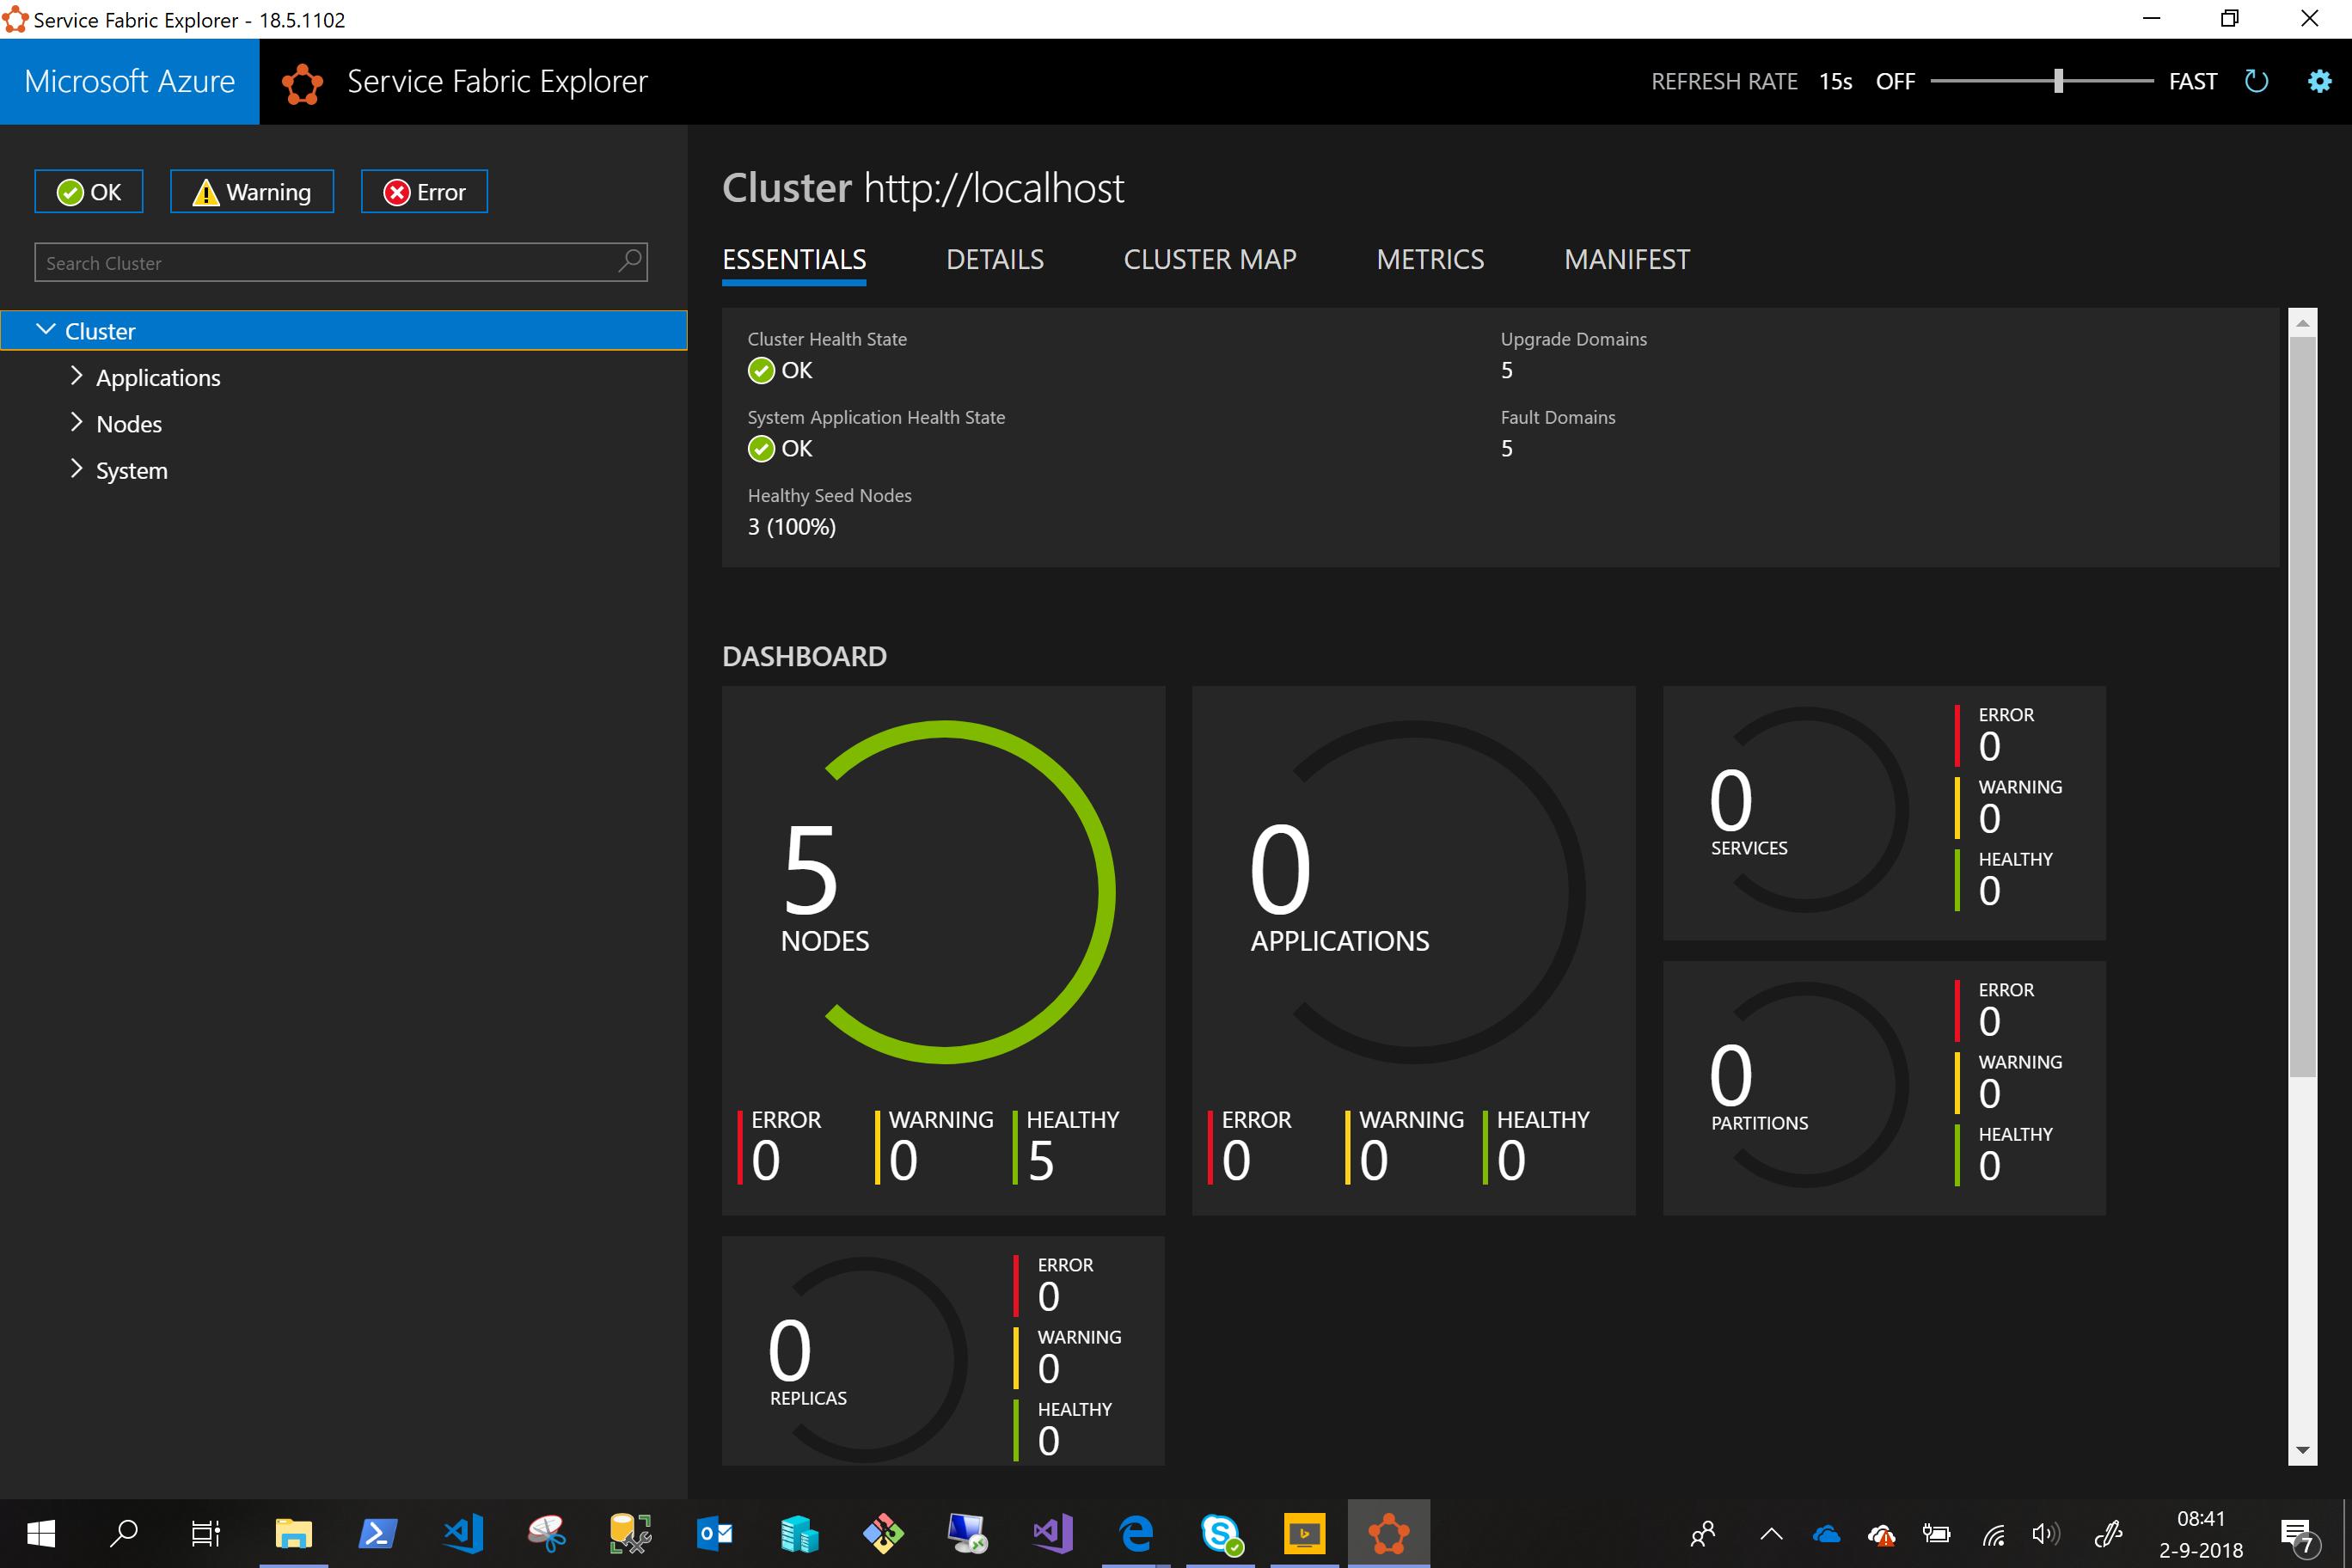 Installing #Azure Service Fabric Cluster on Windows Server